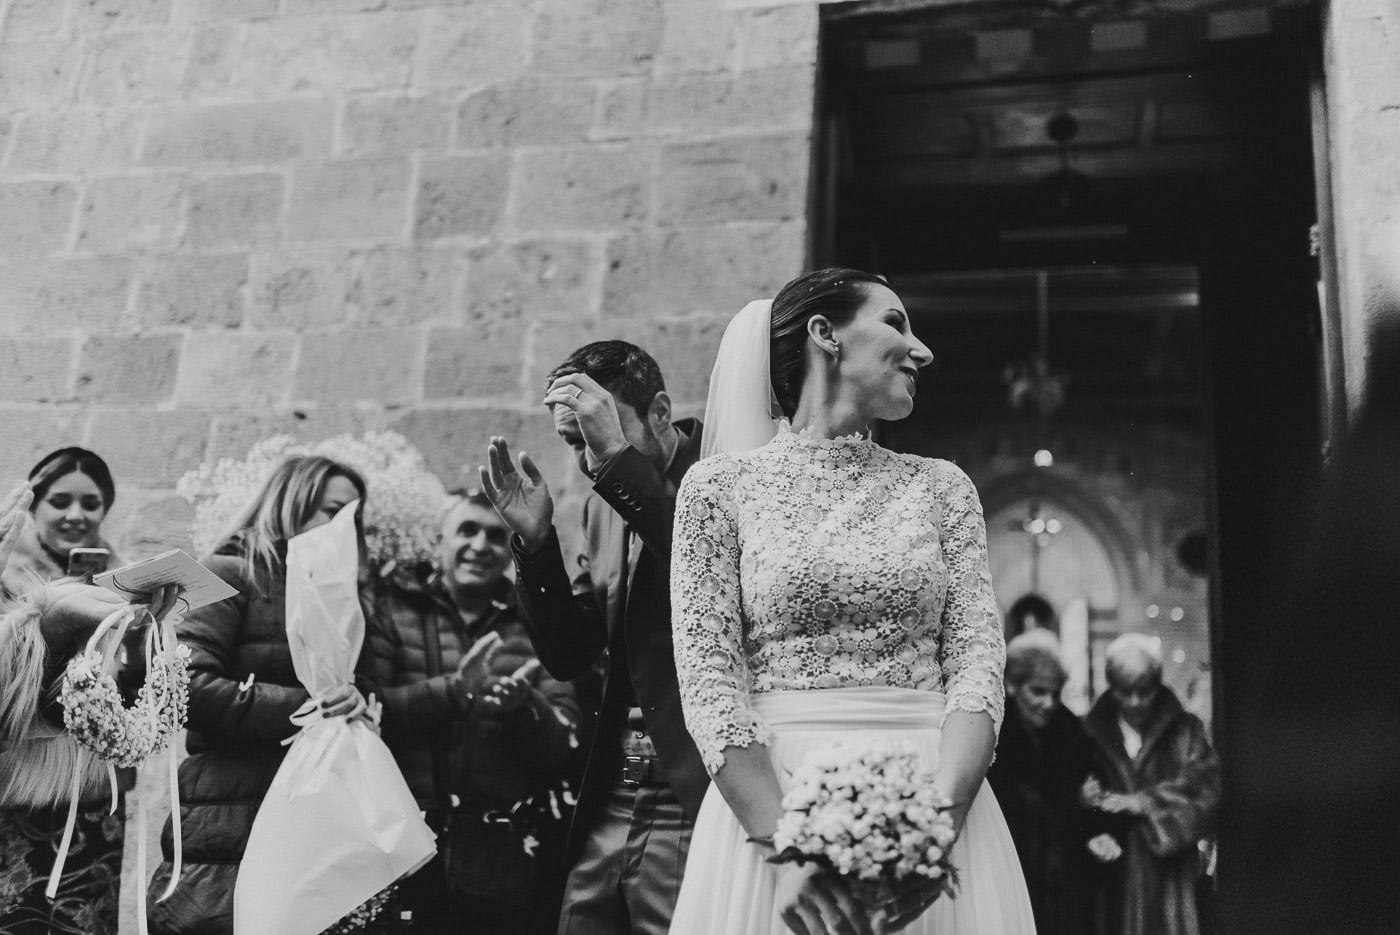 Matrimonio Giulia & Alessandro 28_12 – Alessio Nobili Photographer-32